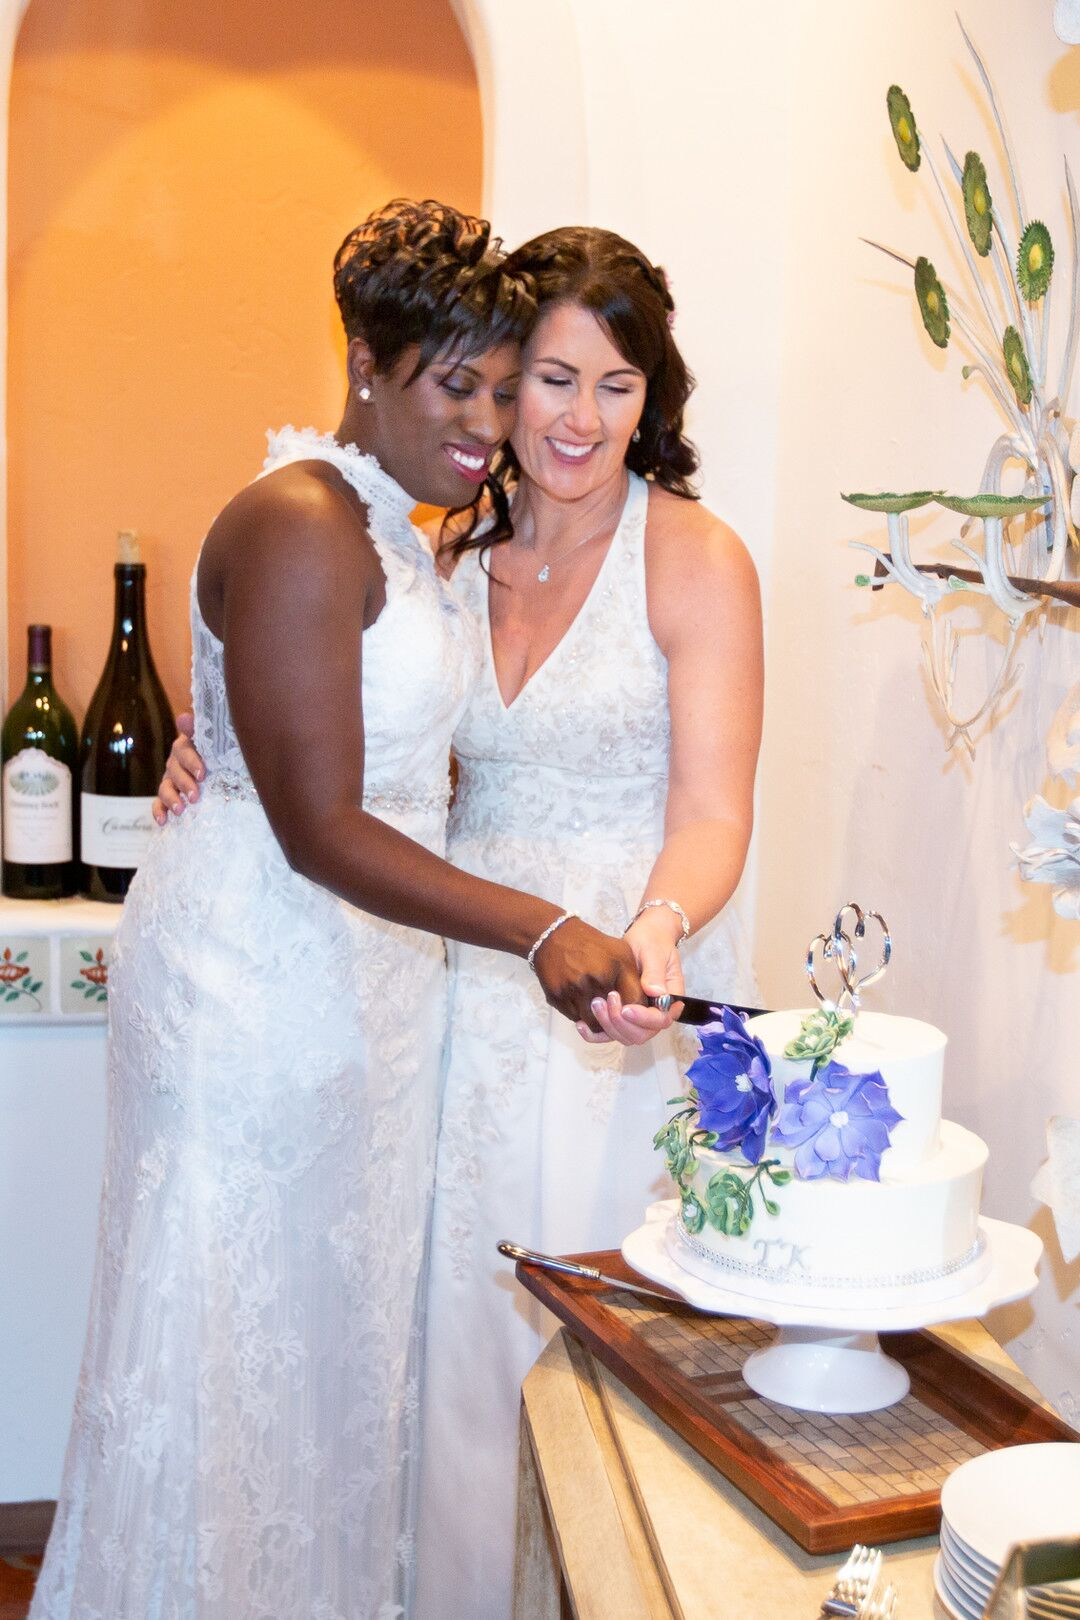 www.santabarbarawedding.com | Venue: The Casitas of Arroyo Grande | Photographer: Renoda Campbell Photography | Second Shooter: John Patrick Images |  Brides Cutting Cake